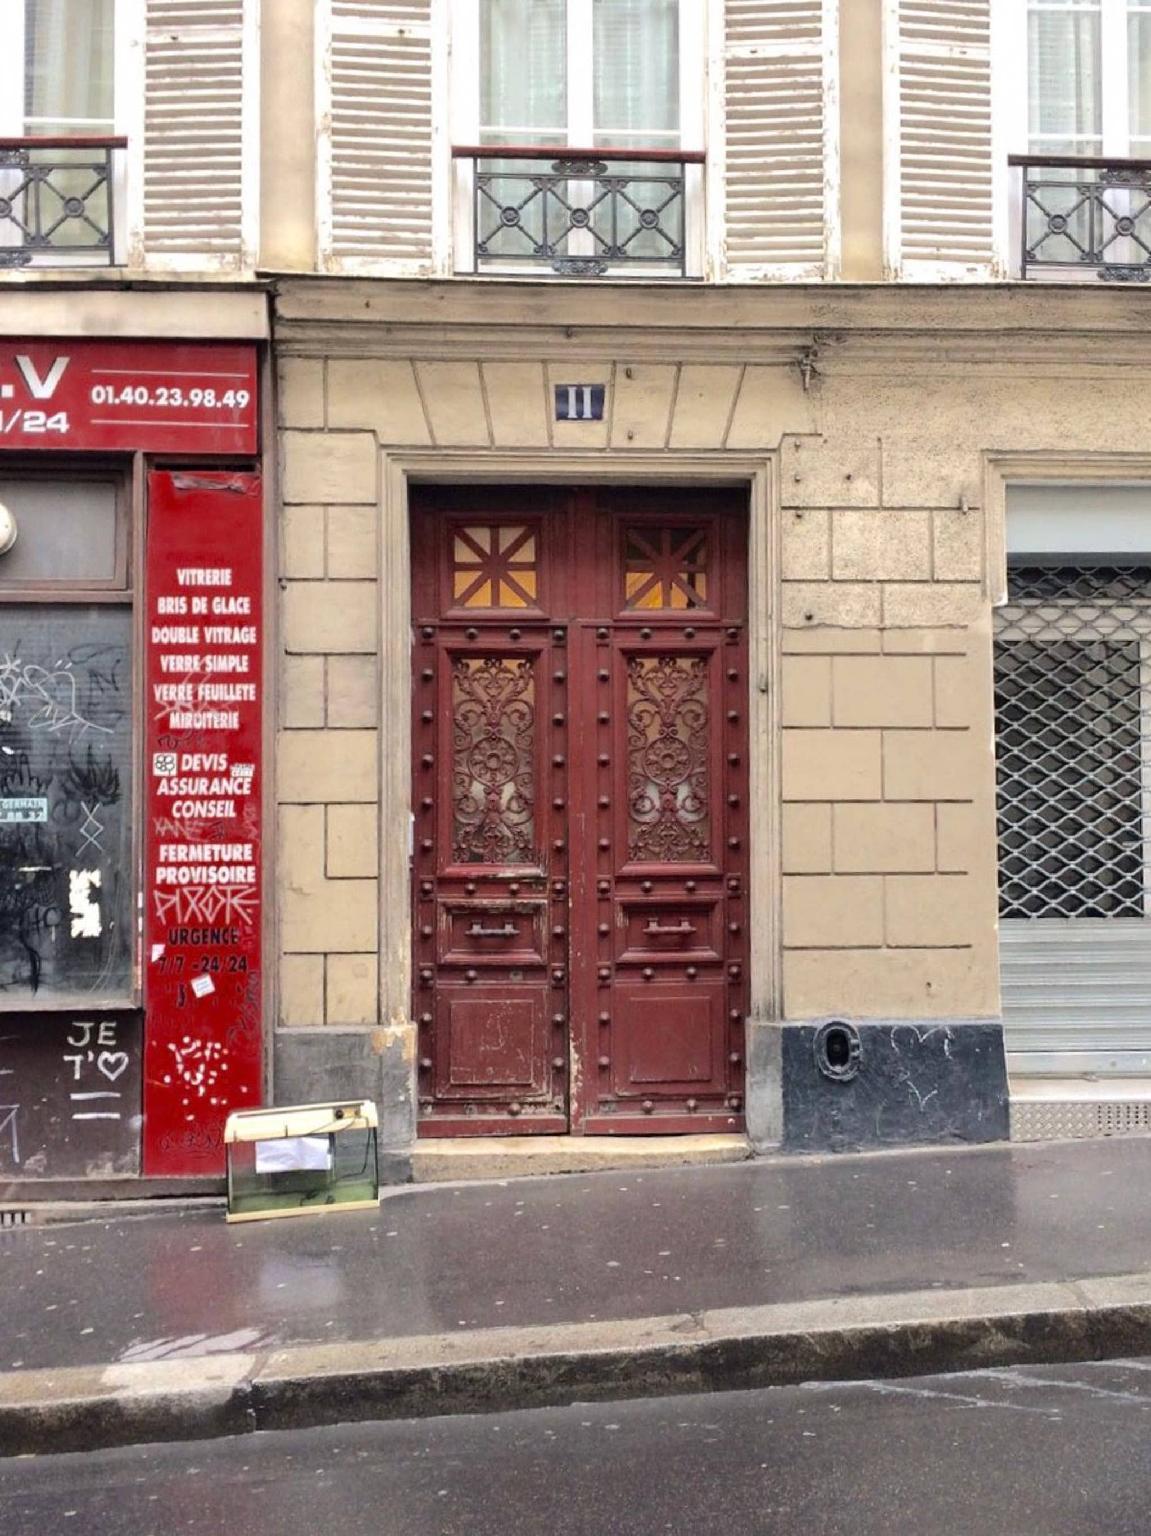 Parisian Family Apart - Sacr Coeur